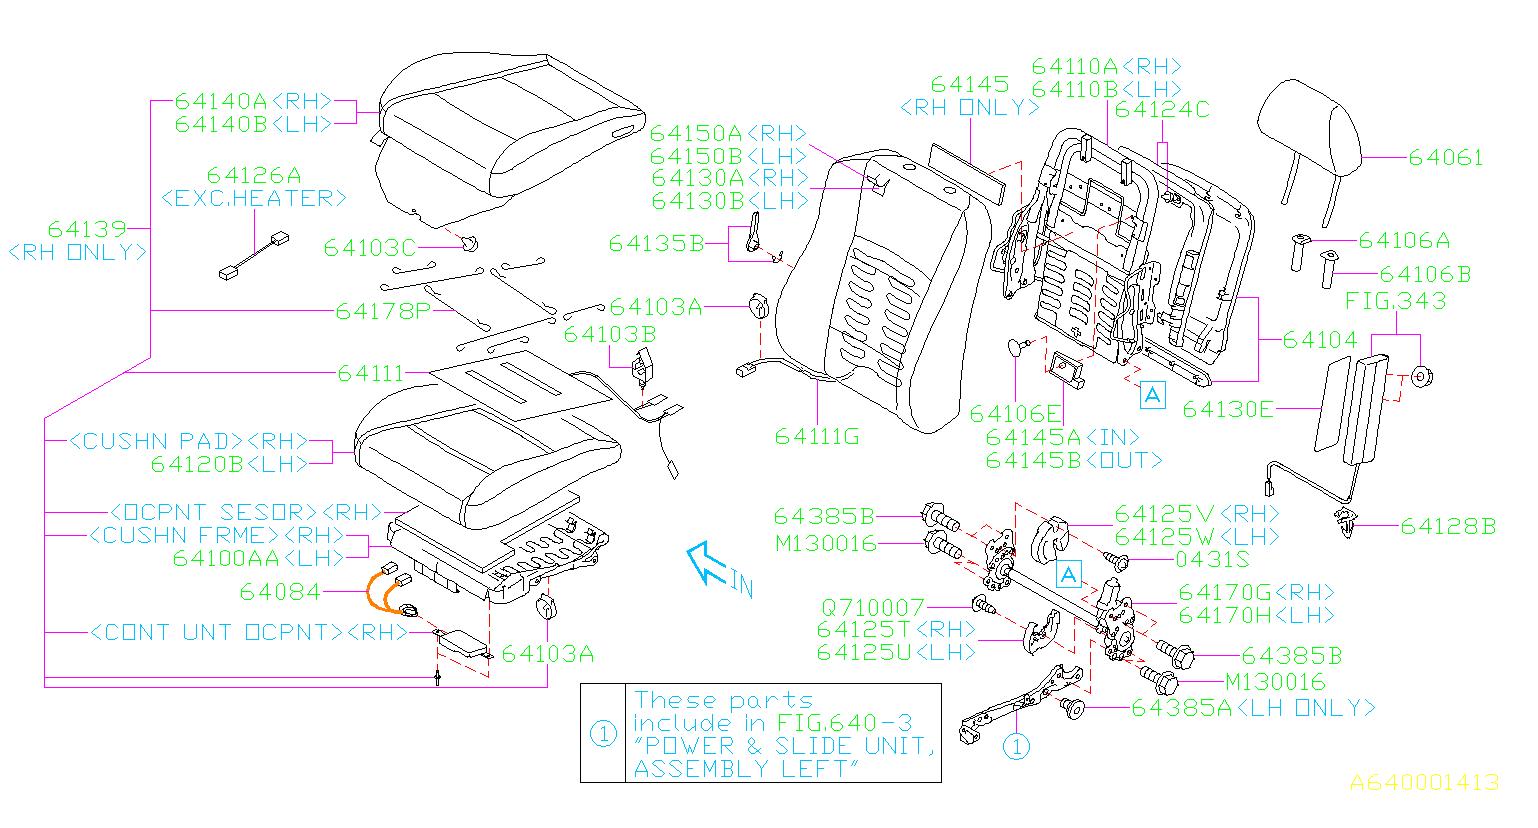 Subaru Outback Interior Parts Diagram Trusted Wiring Diagrams Exhaust 2006